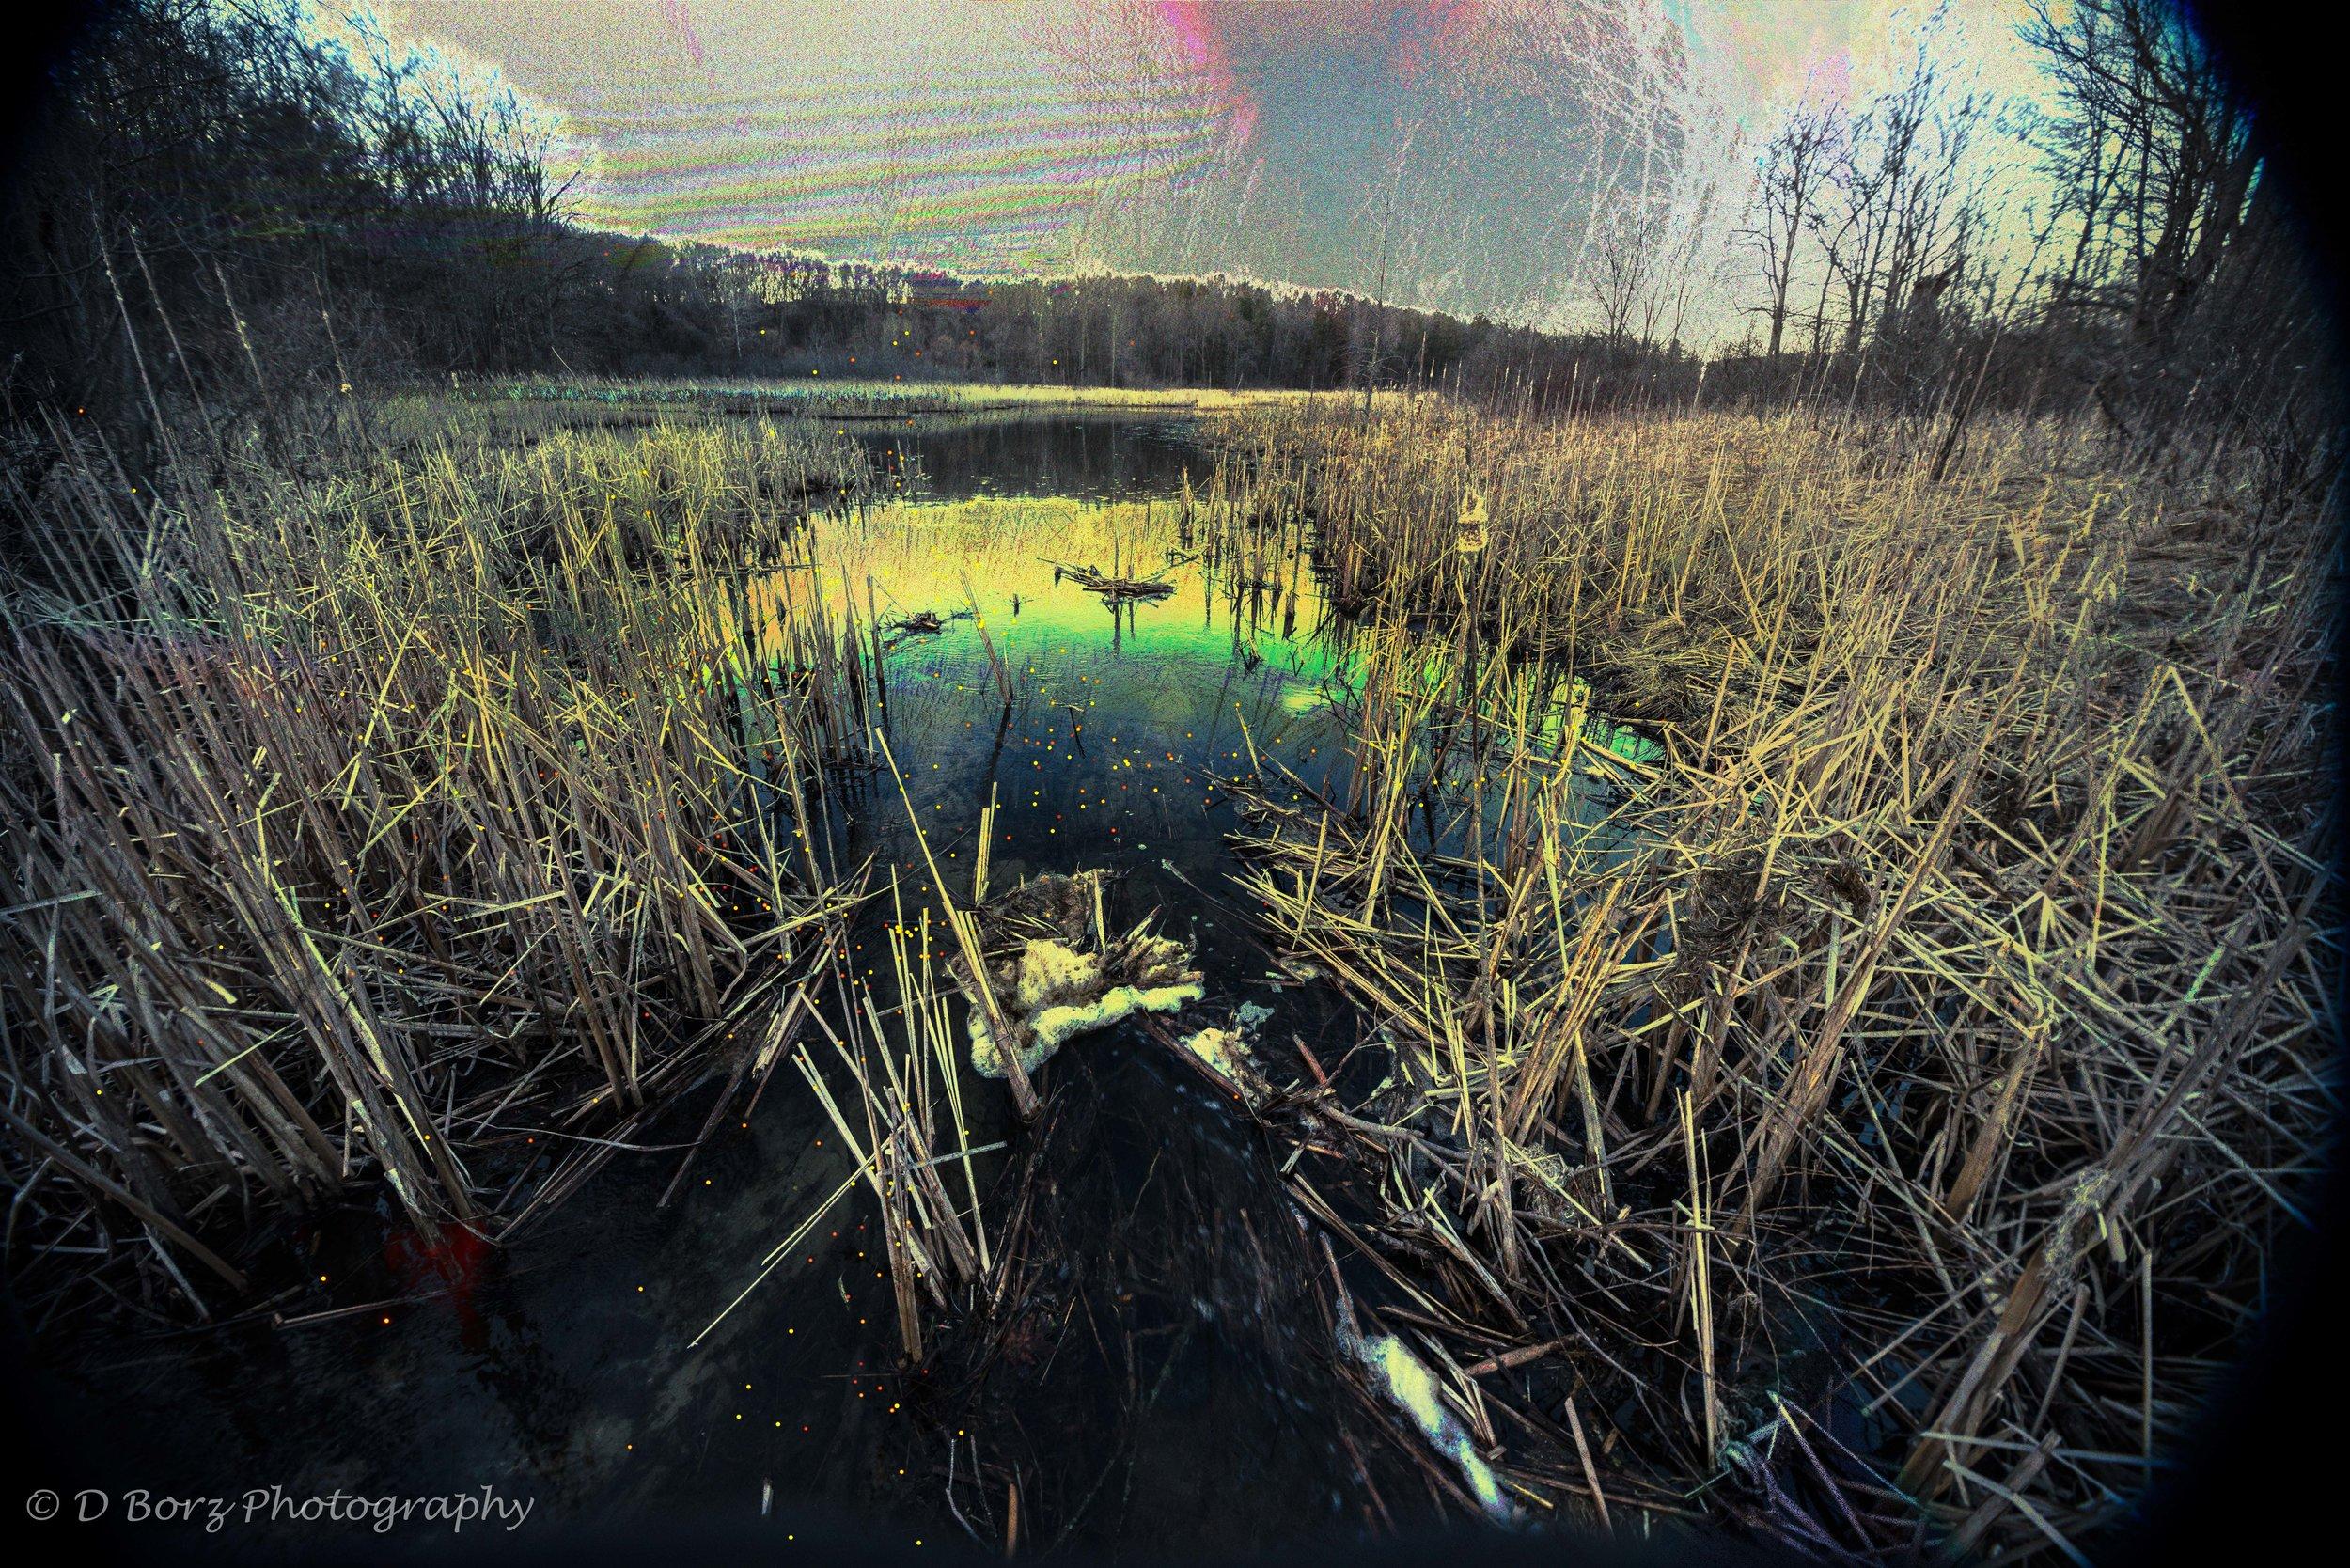 borzkowski_d_soundscape-19.jpg